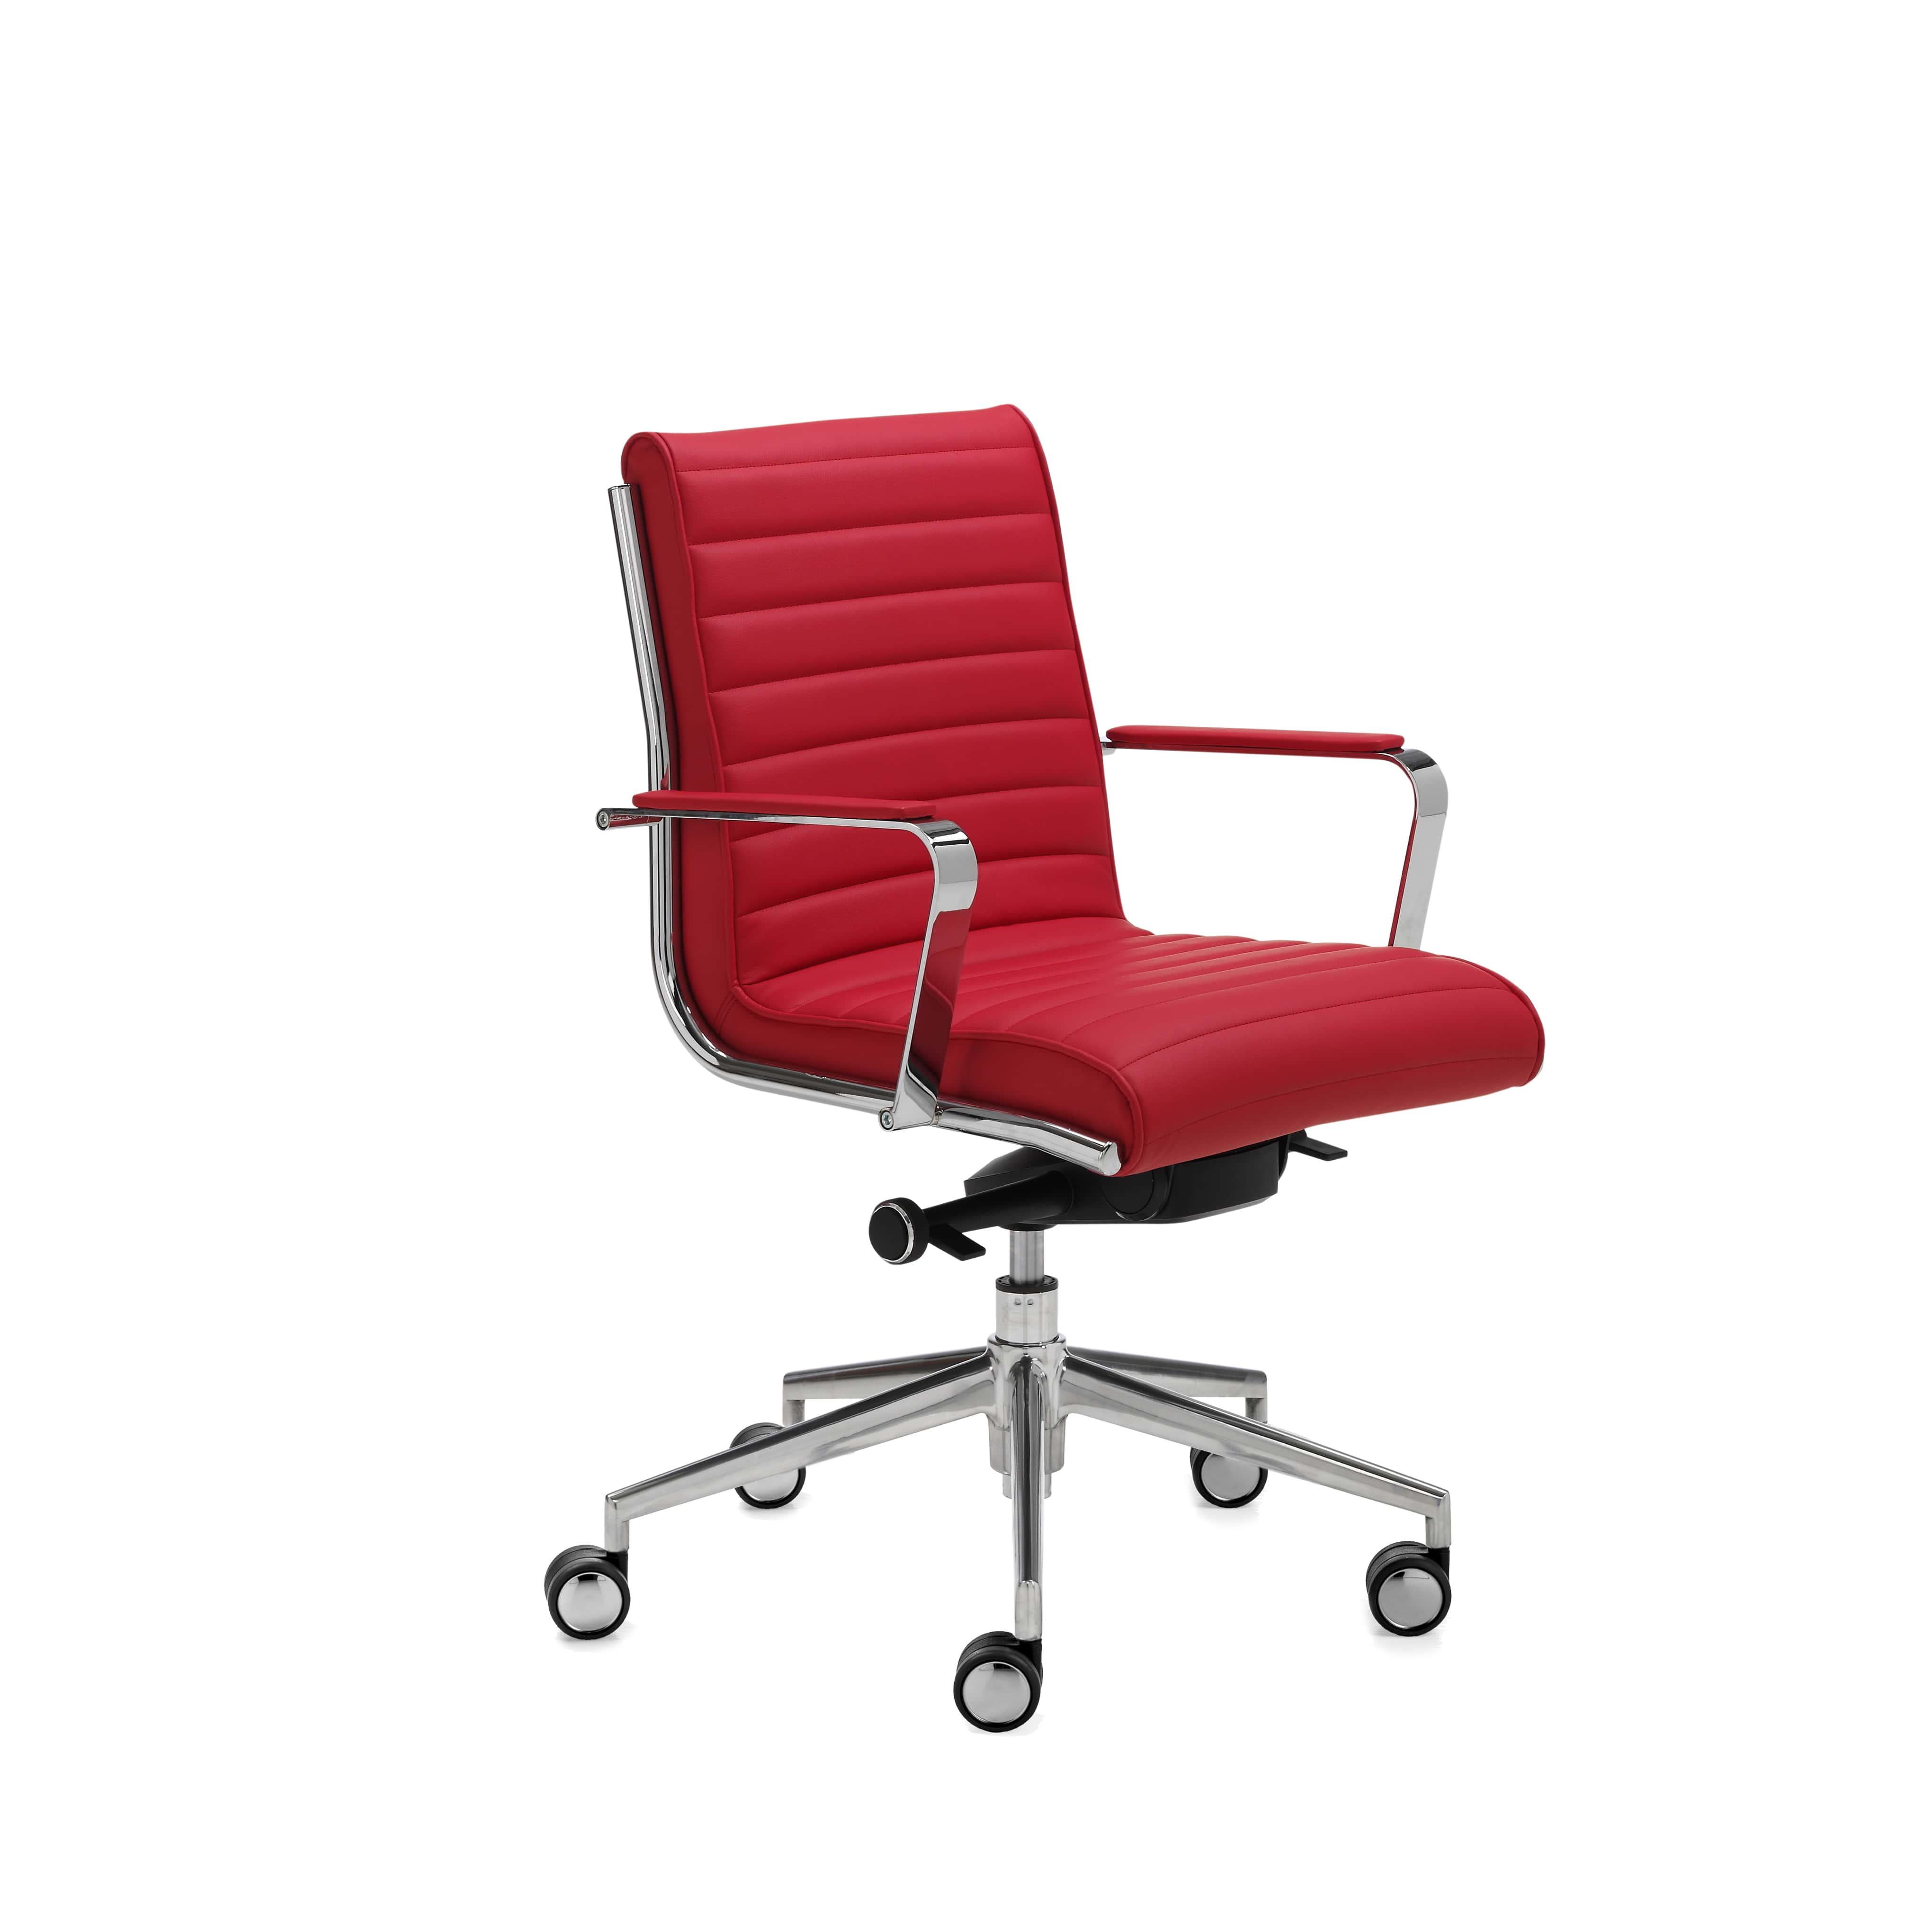 sillas-oficina-General-muebles-paco-caballero-454-5caf5d99e1b13